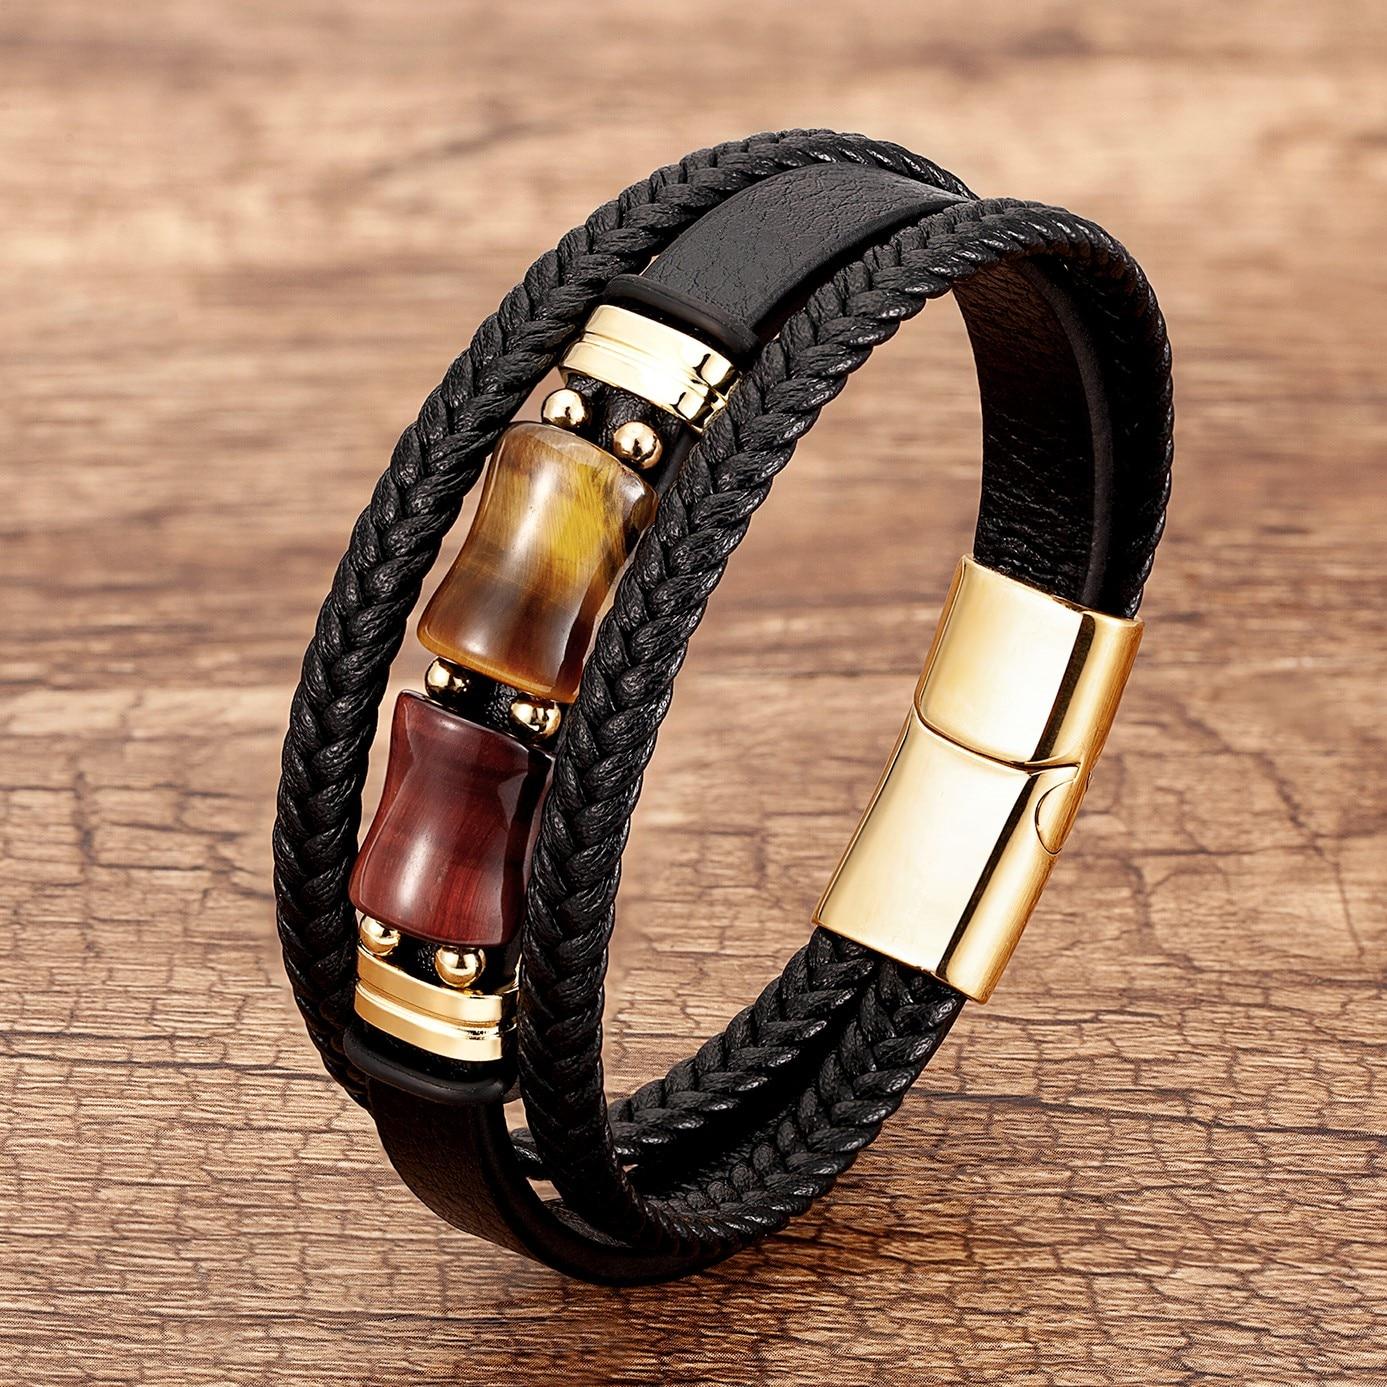 Natural Tiger Eye Stone Bracelet Multilayer Braided Genuine Leather